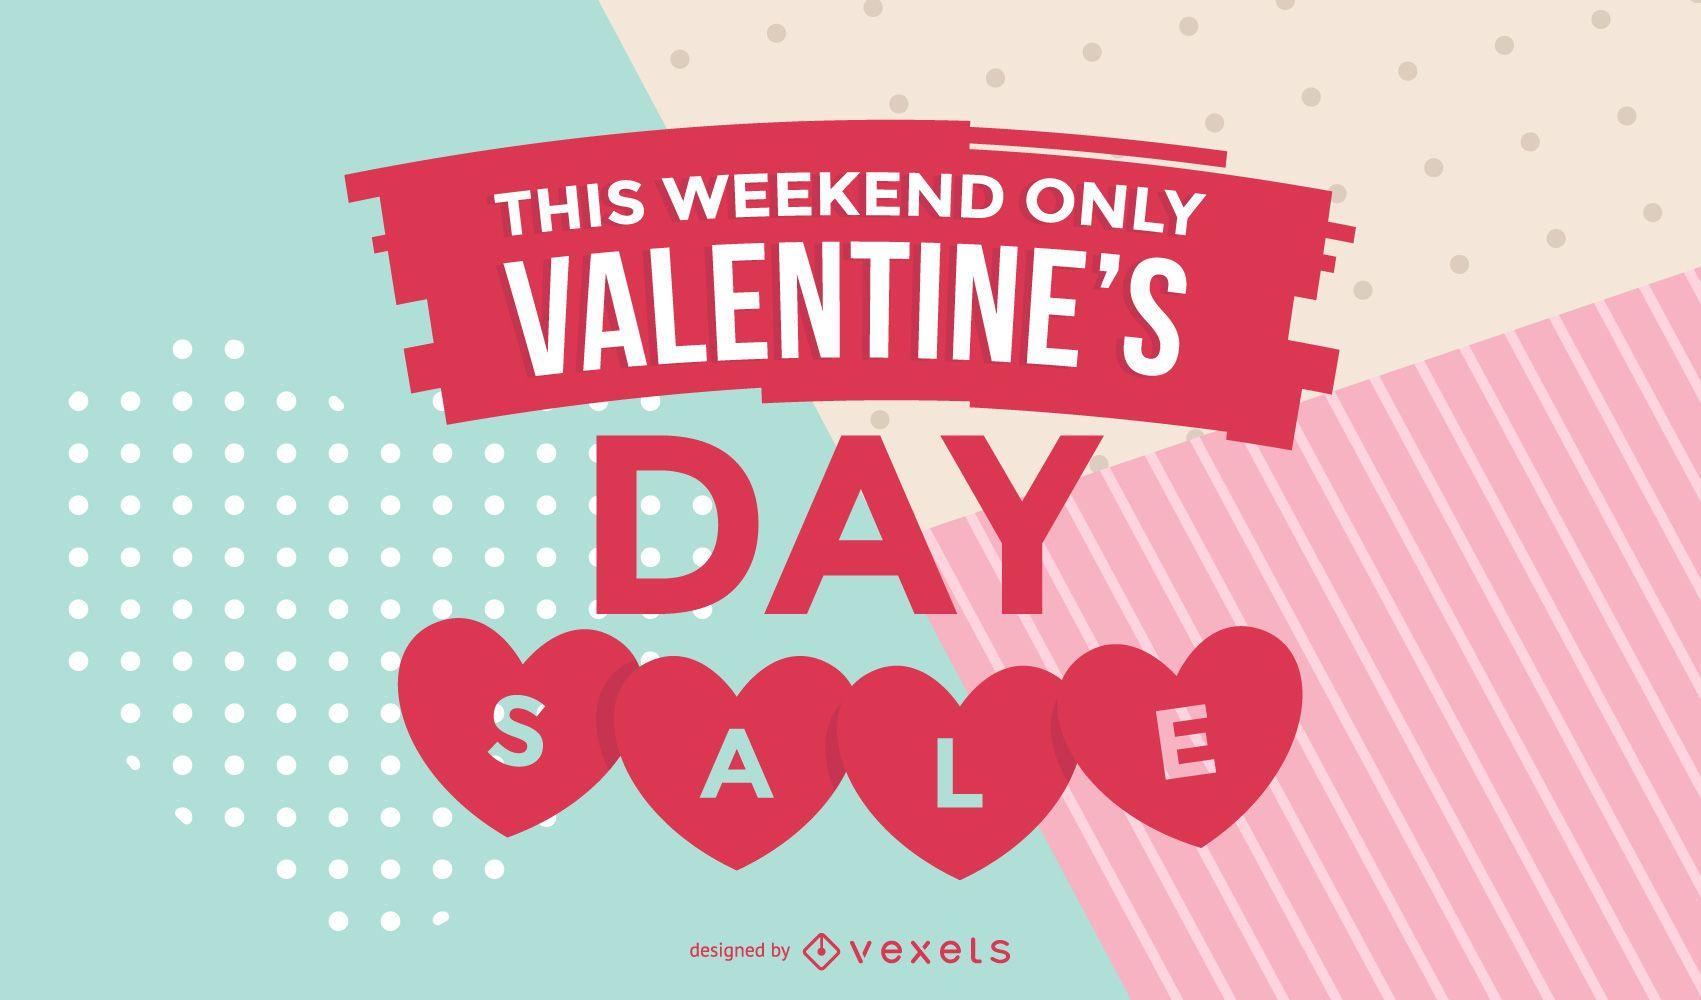 Valentine's Day Sale Promo Design